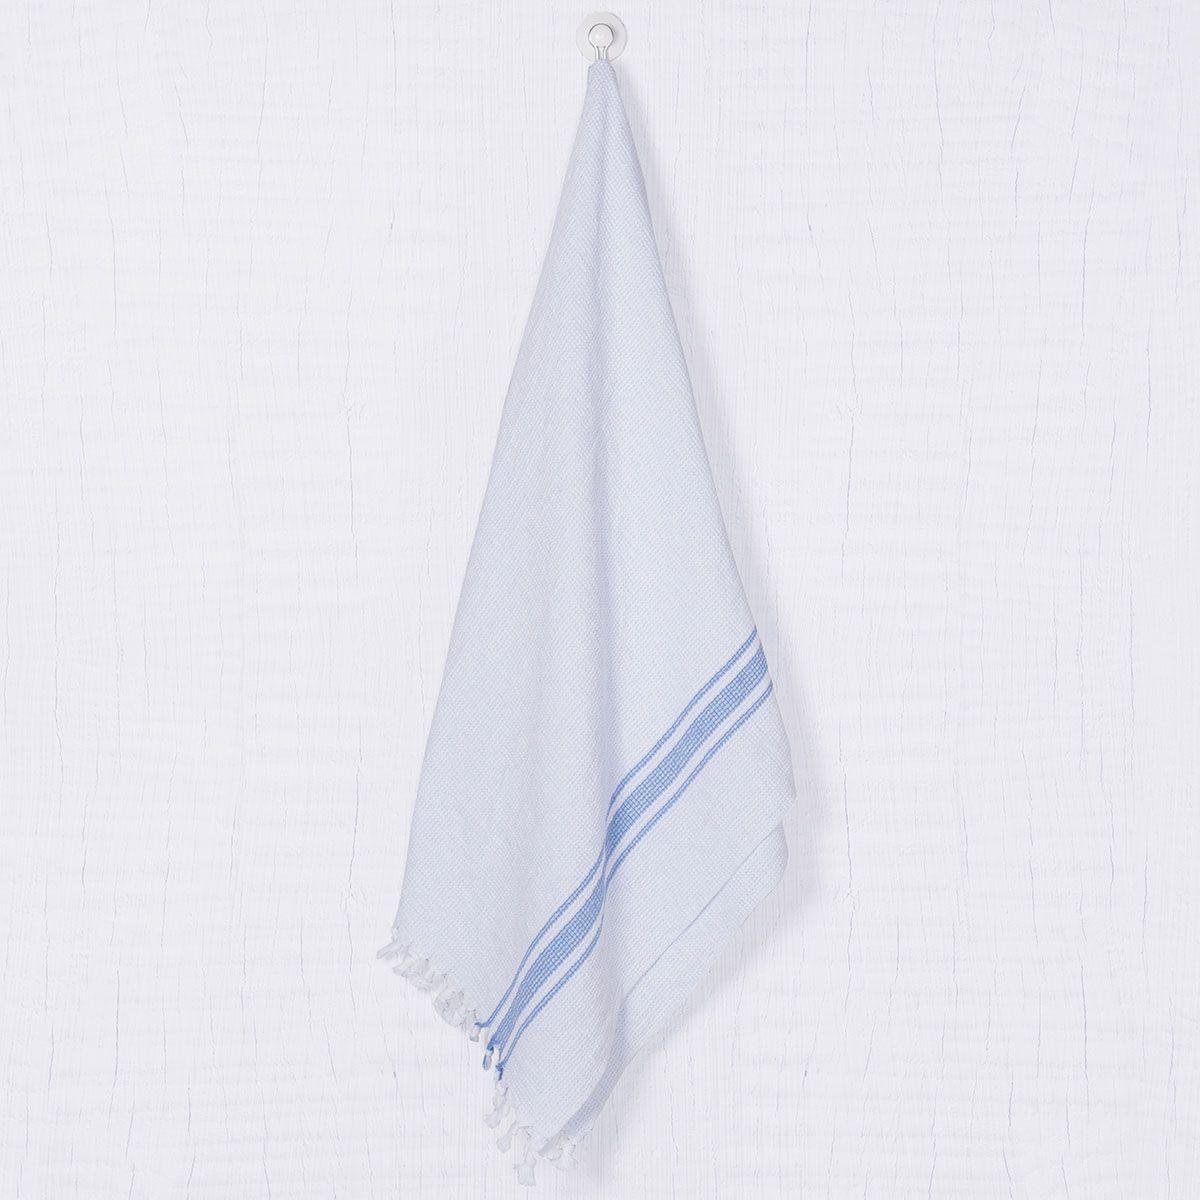 Peshtowel SLPAN - White / Blue Stripes